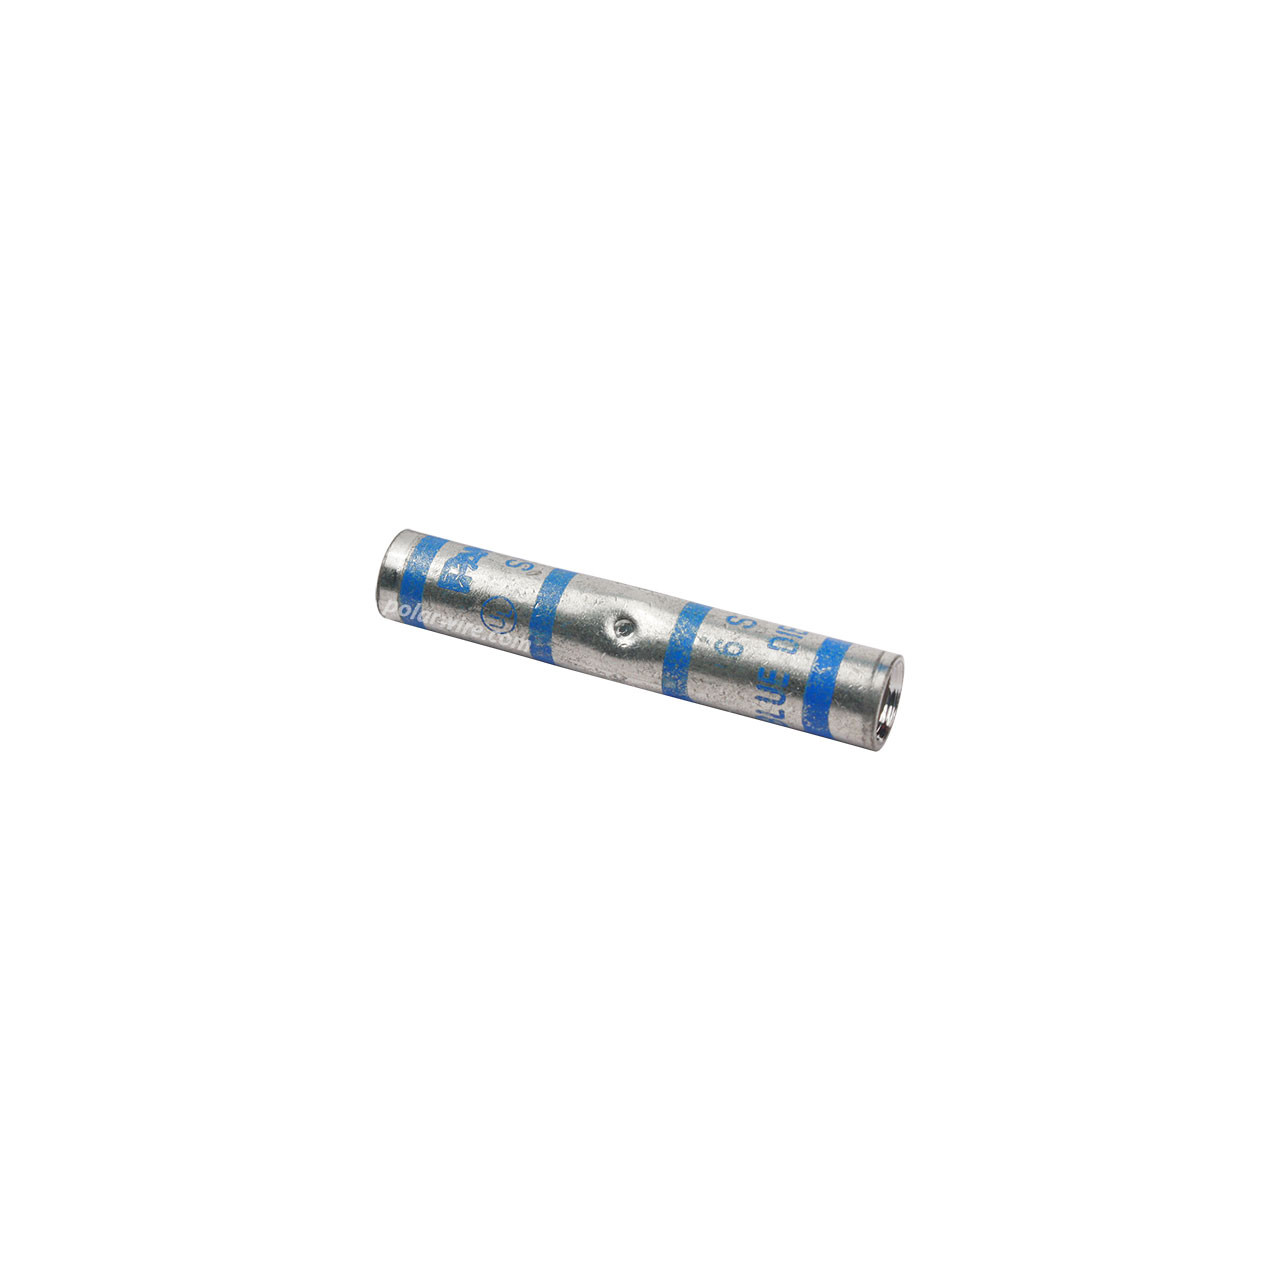 6GA 600V STD BRL SPLICE - Polar Wire Products